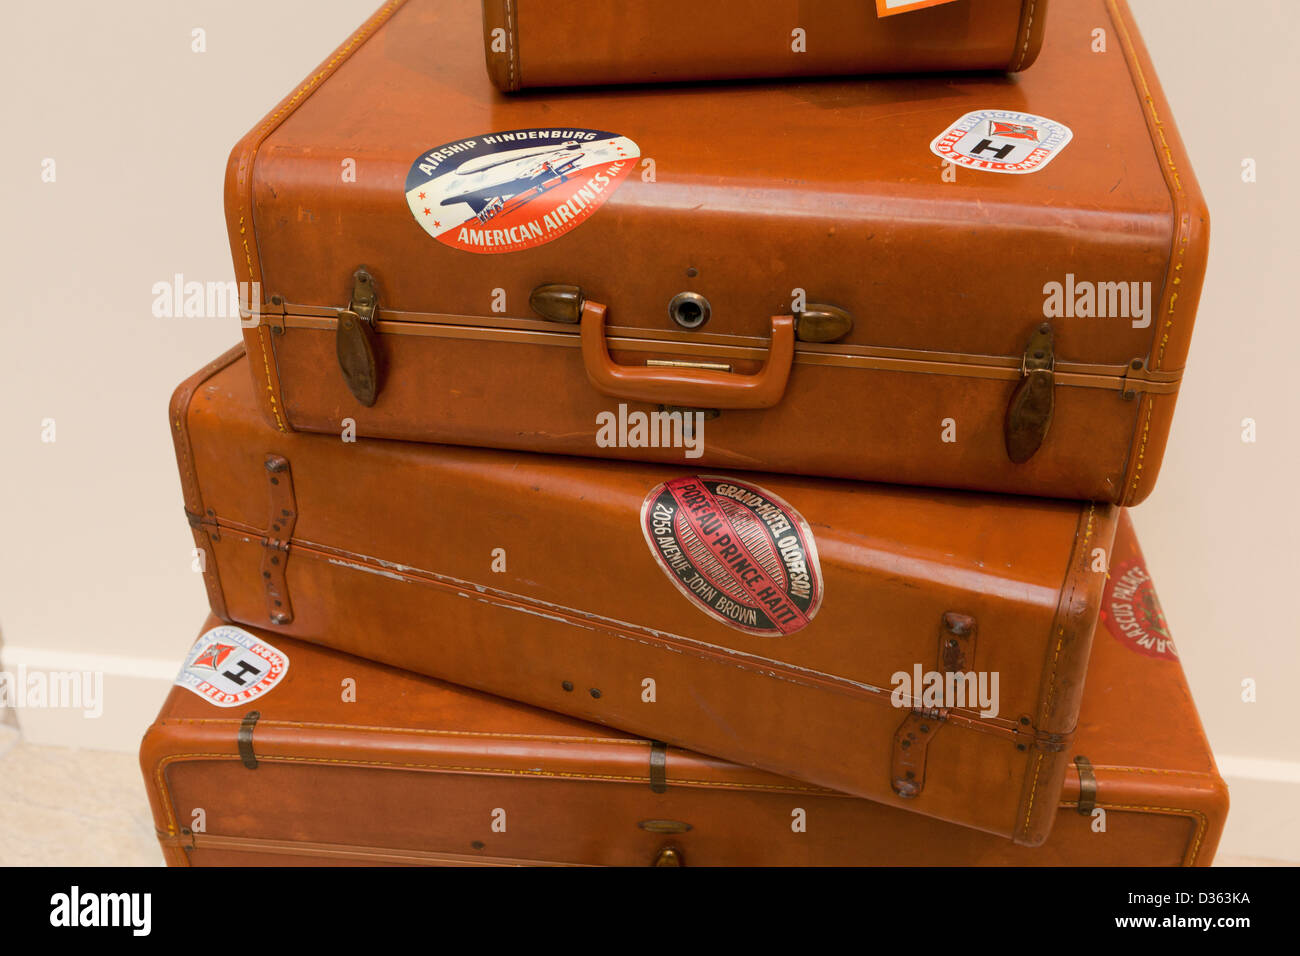 Vintage leather luggage - Stock Image